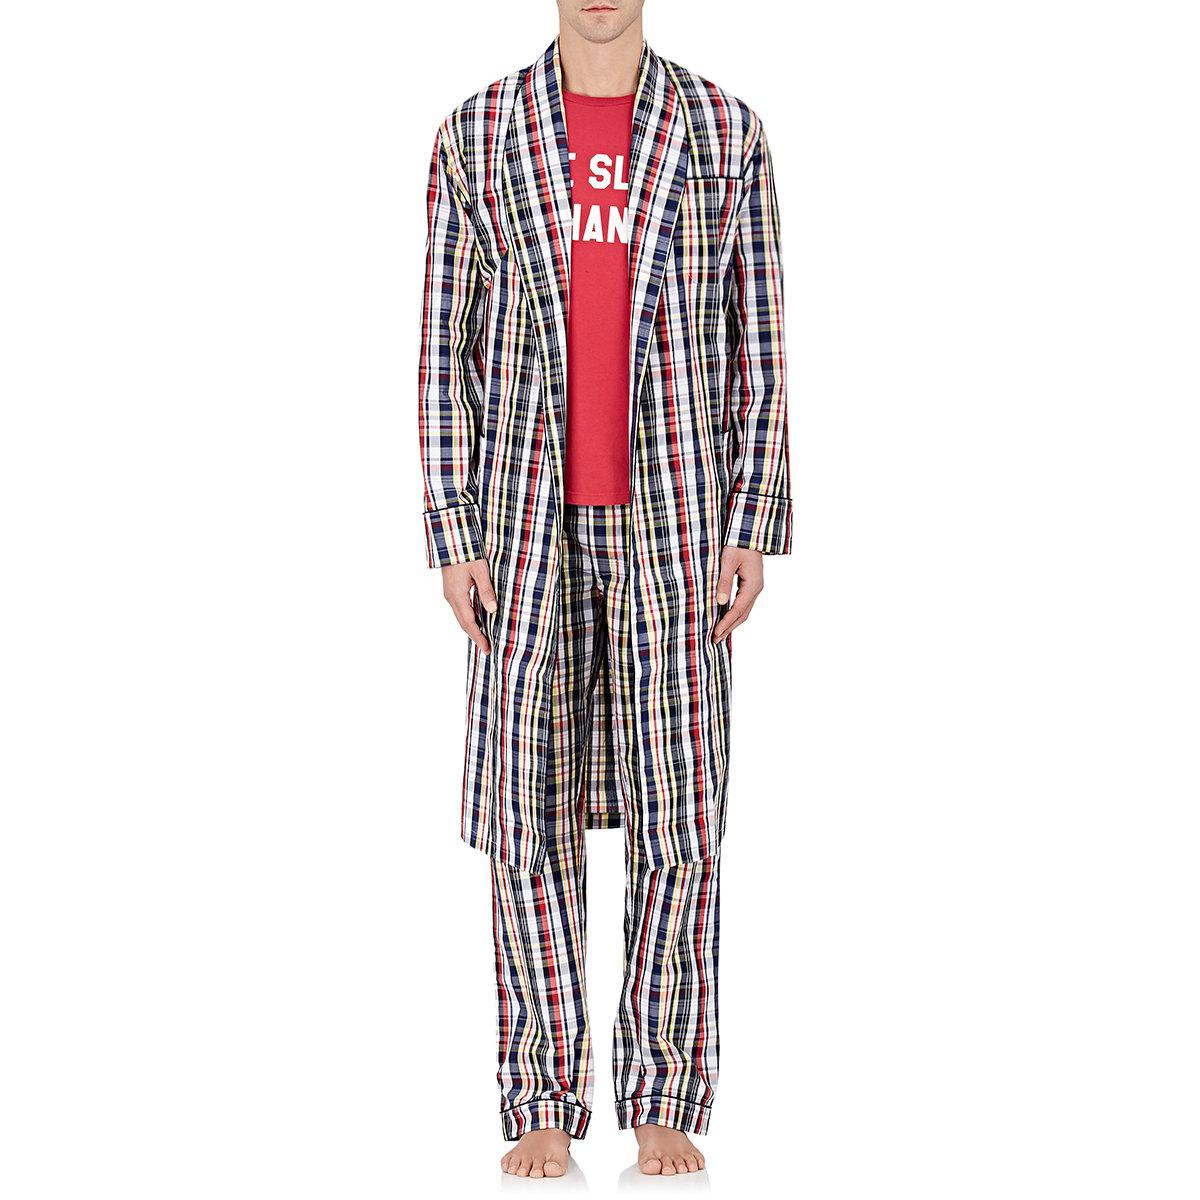 Lyst - Sleepy Jones Madras Plaid Cotton Robe in Red for Men 4bd89752d